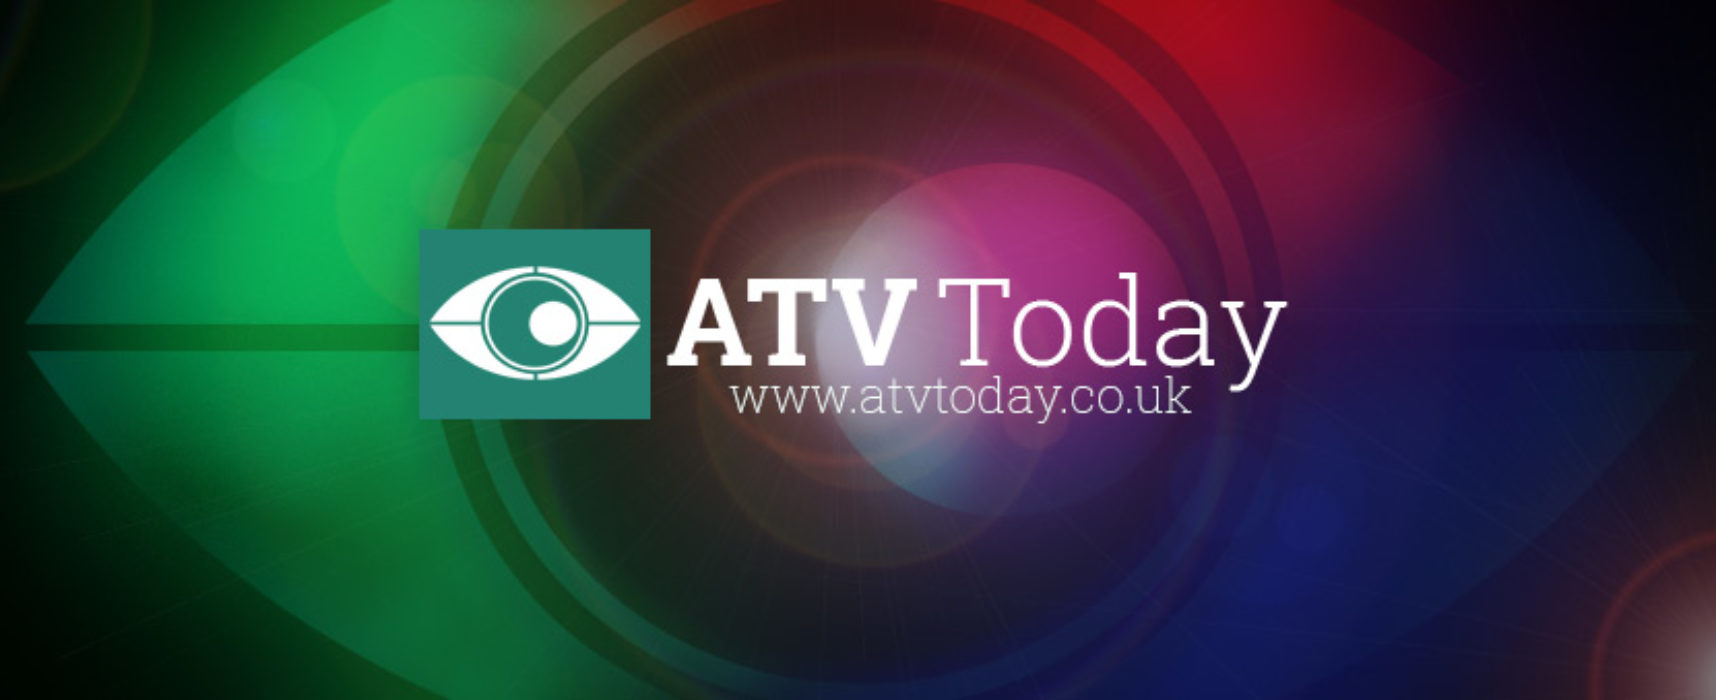 ATV Today: Holiday Monday News Round-Up